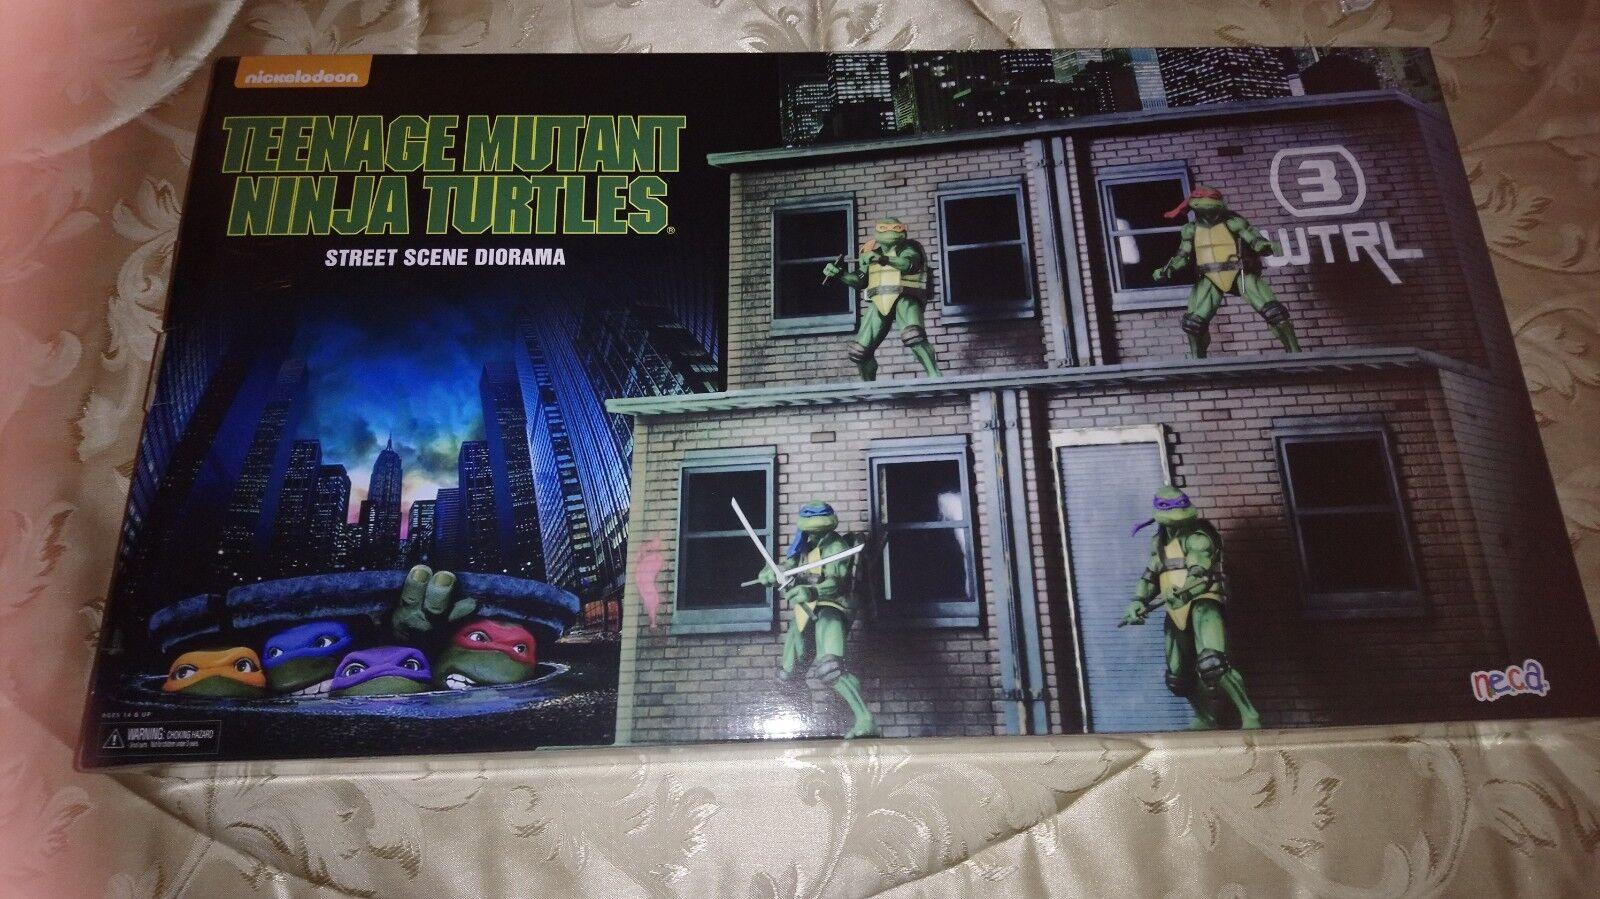 2018 NECA SDCC Exclusive Teenage  Mutant Ninja Turtles Diorama Only  consegna gratuita e veloce disponibile